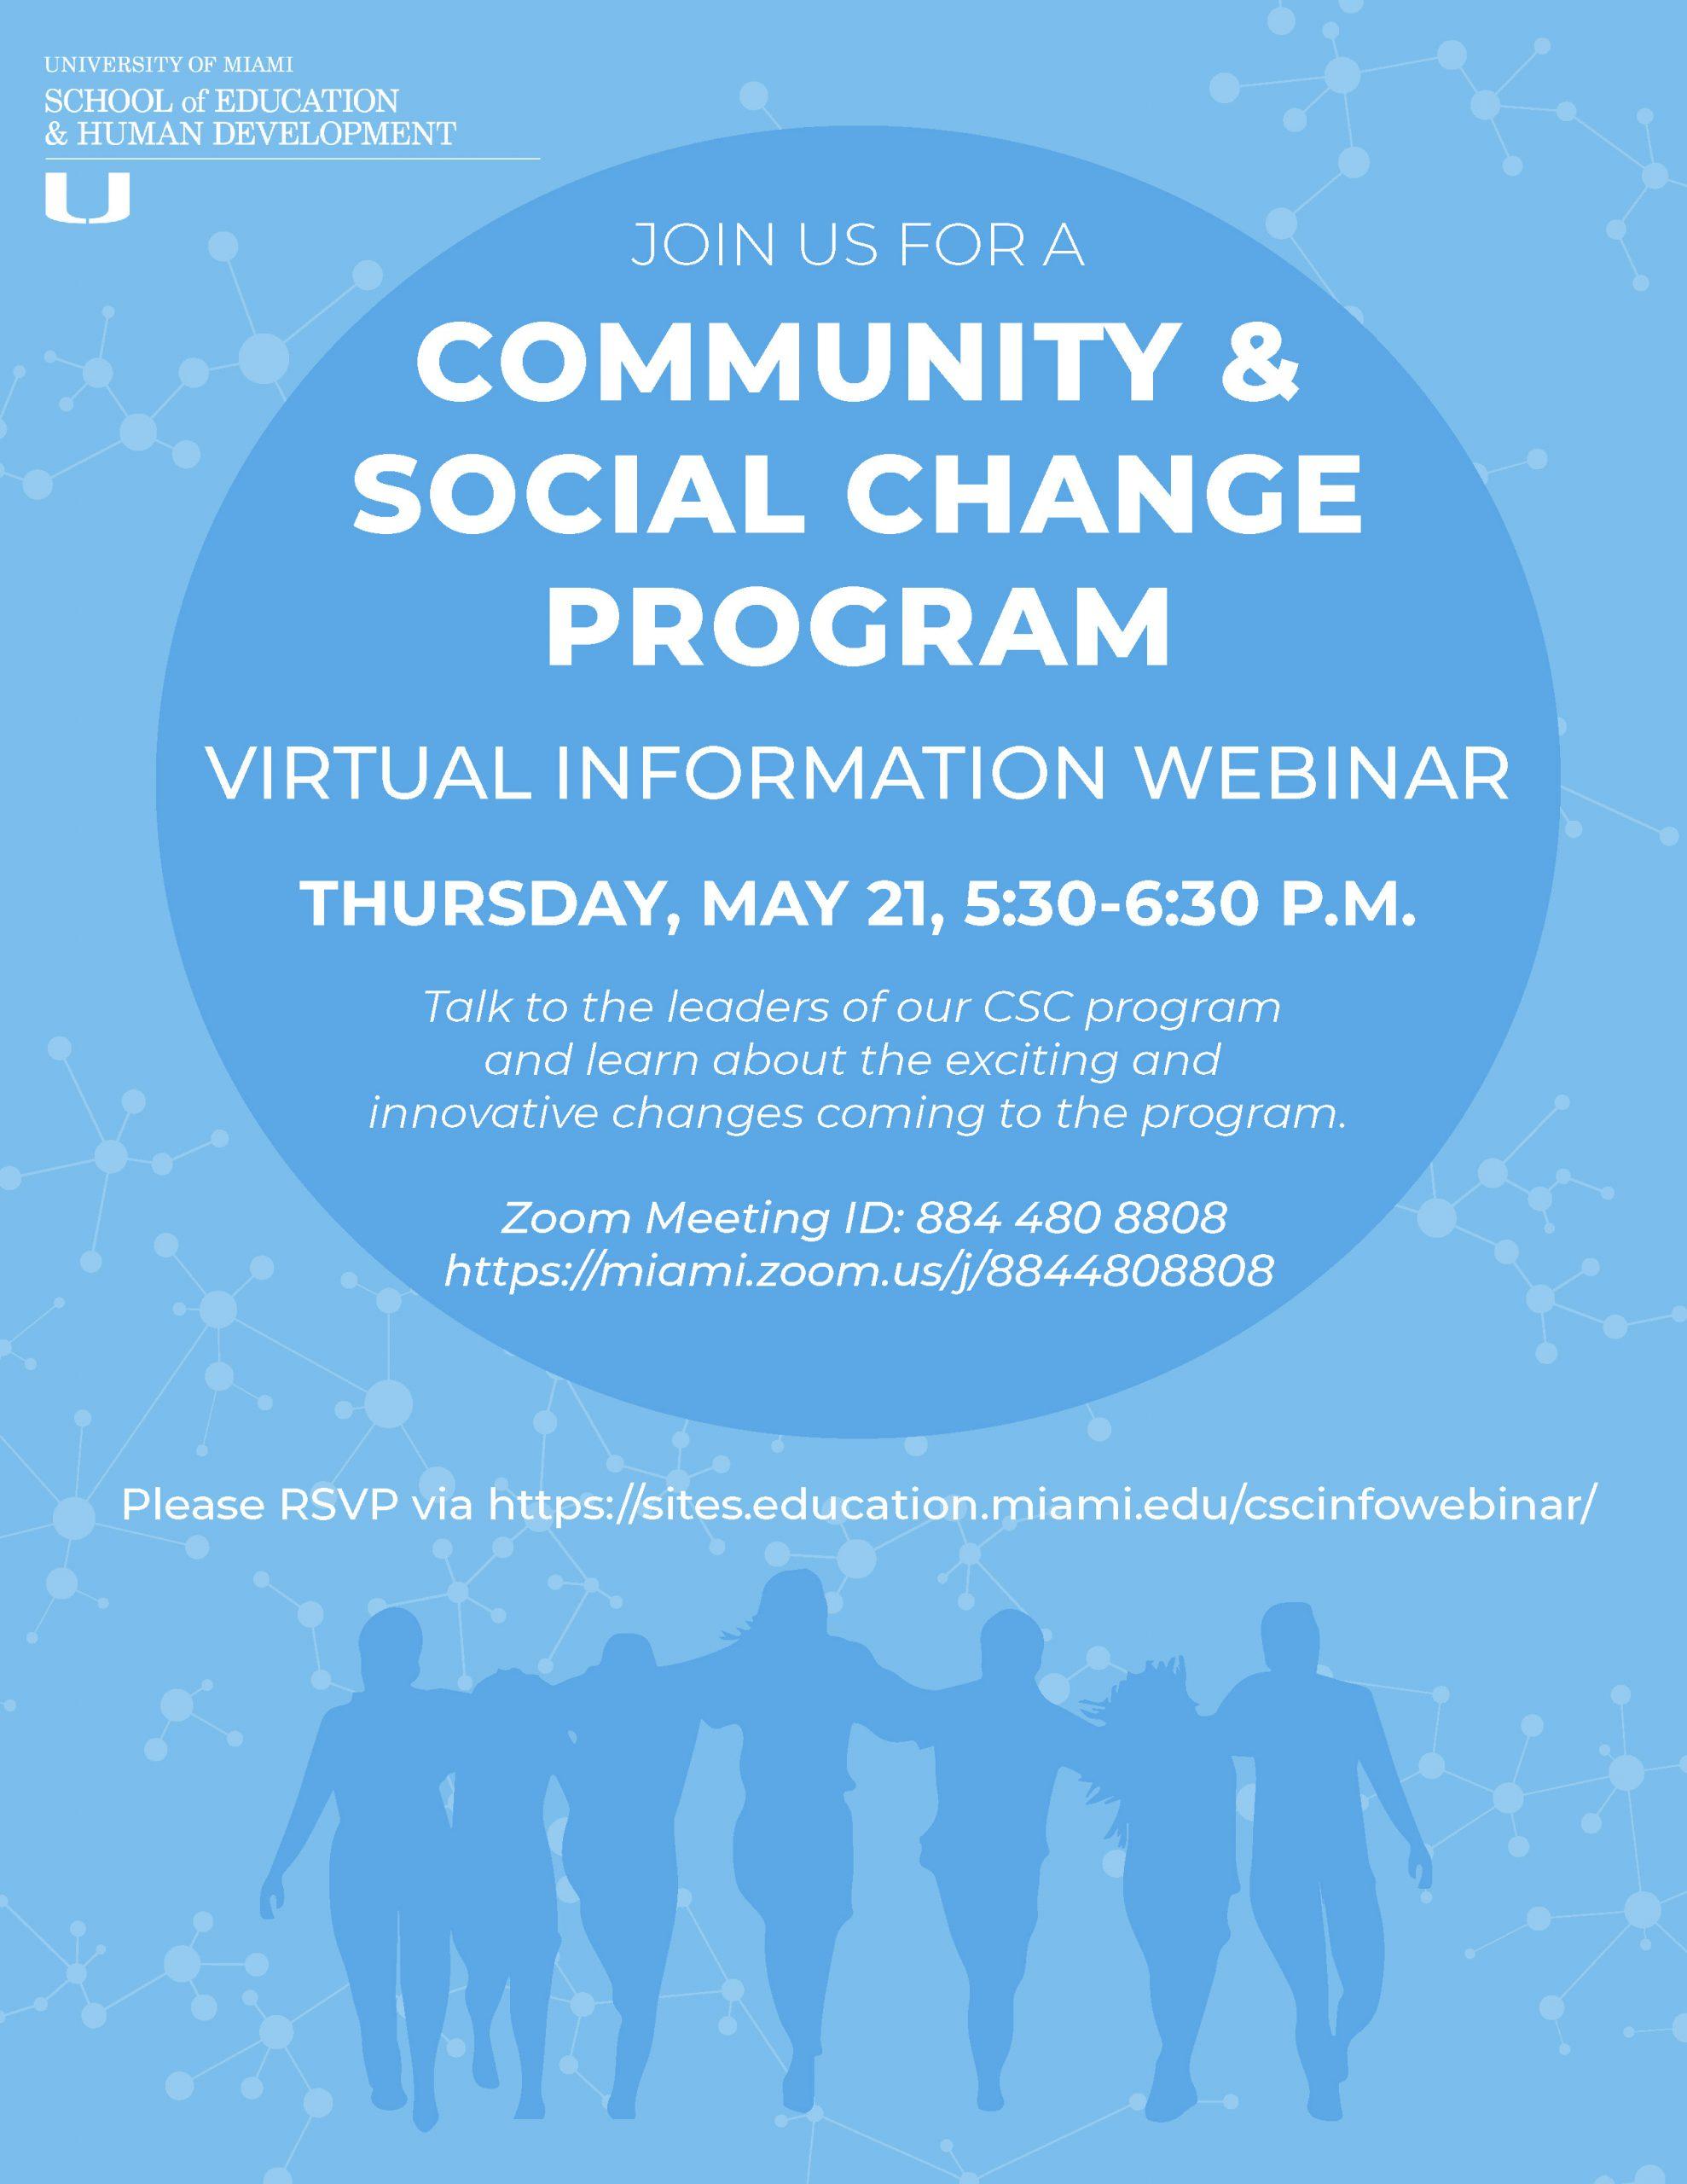 Community and Social Change Program Virtual Information Webinar